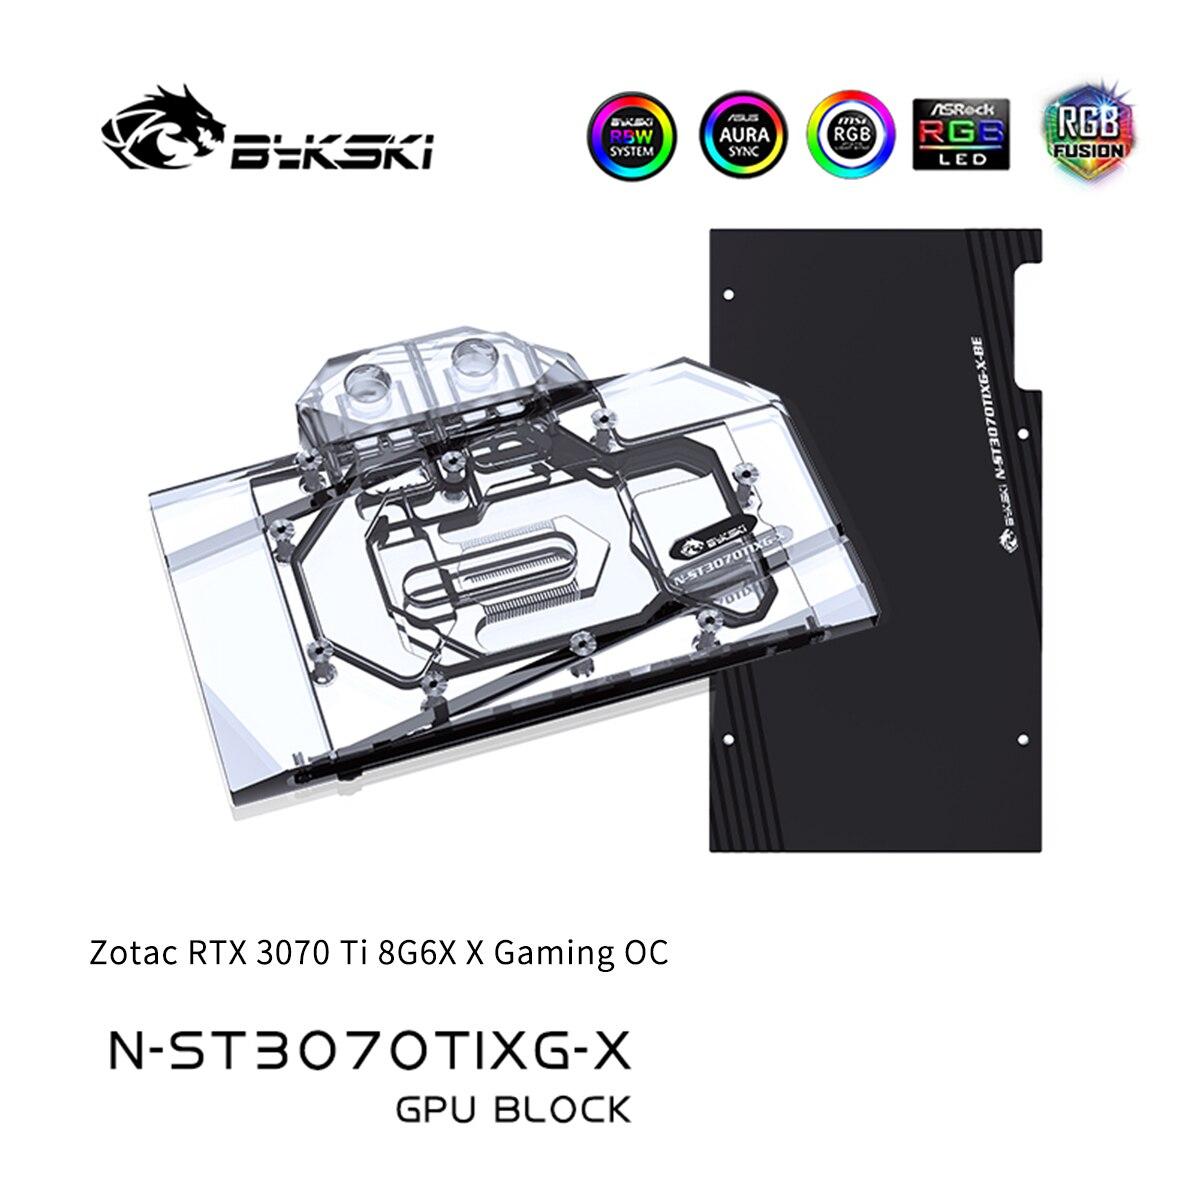 Bykski GPU كتلة ل Zotac RTX 3070 Ti 8G6X X الألعاب OC غطاء كامل GPU تبريد المياه برودة N-ST3070TIXG-X